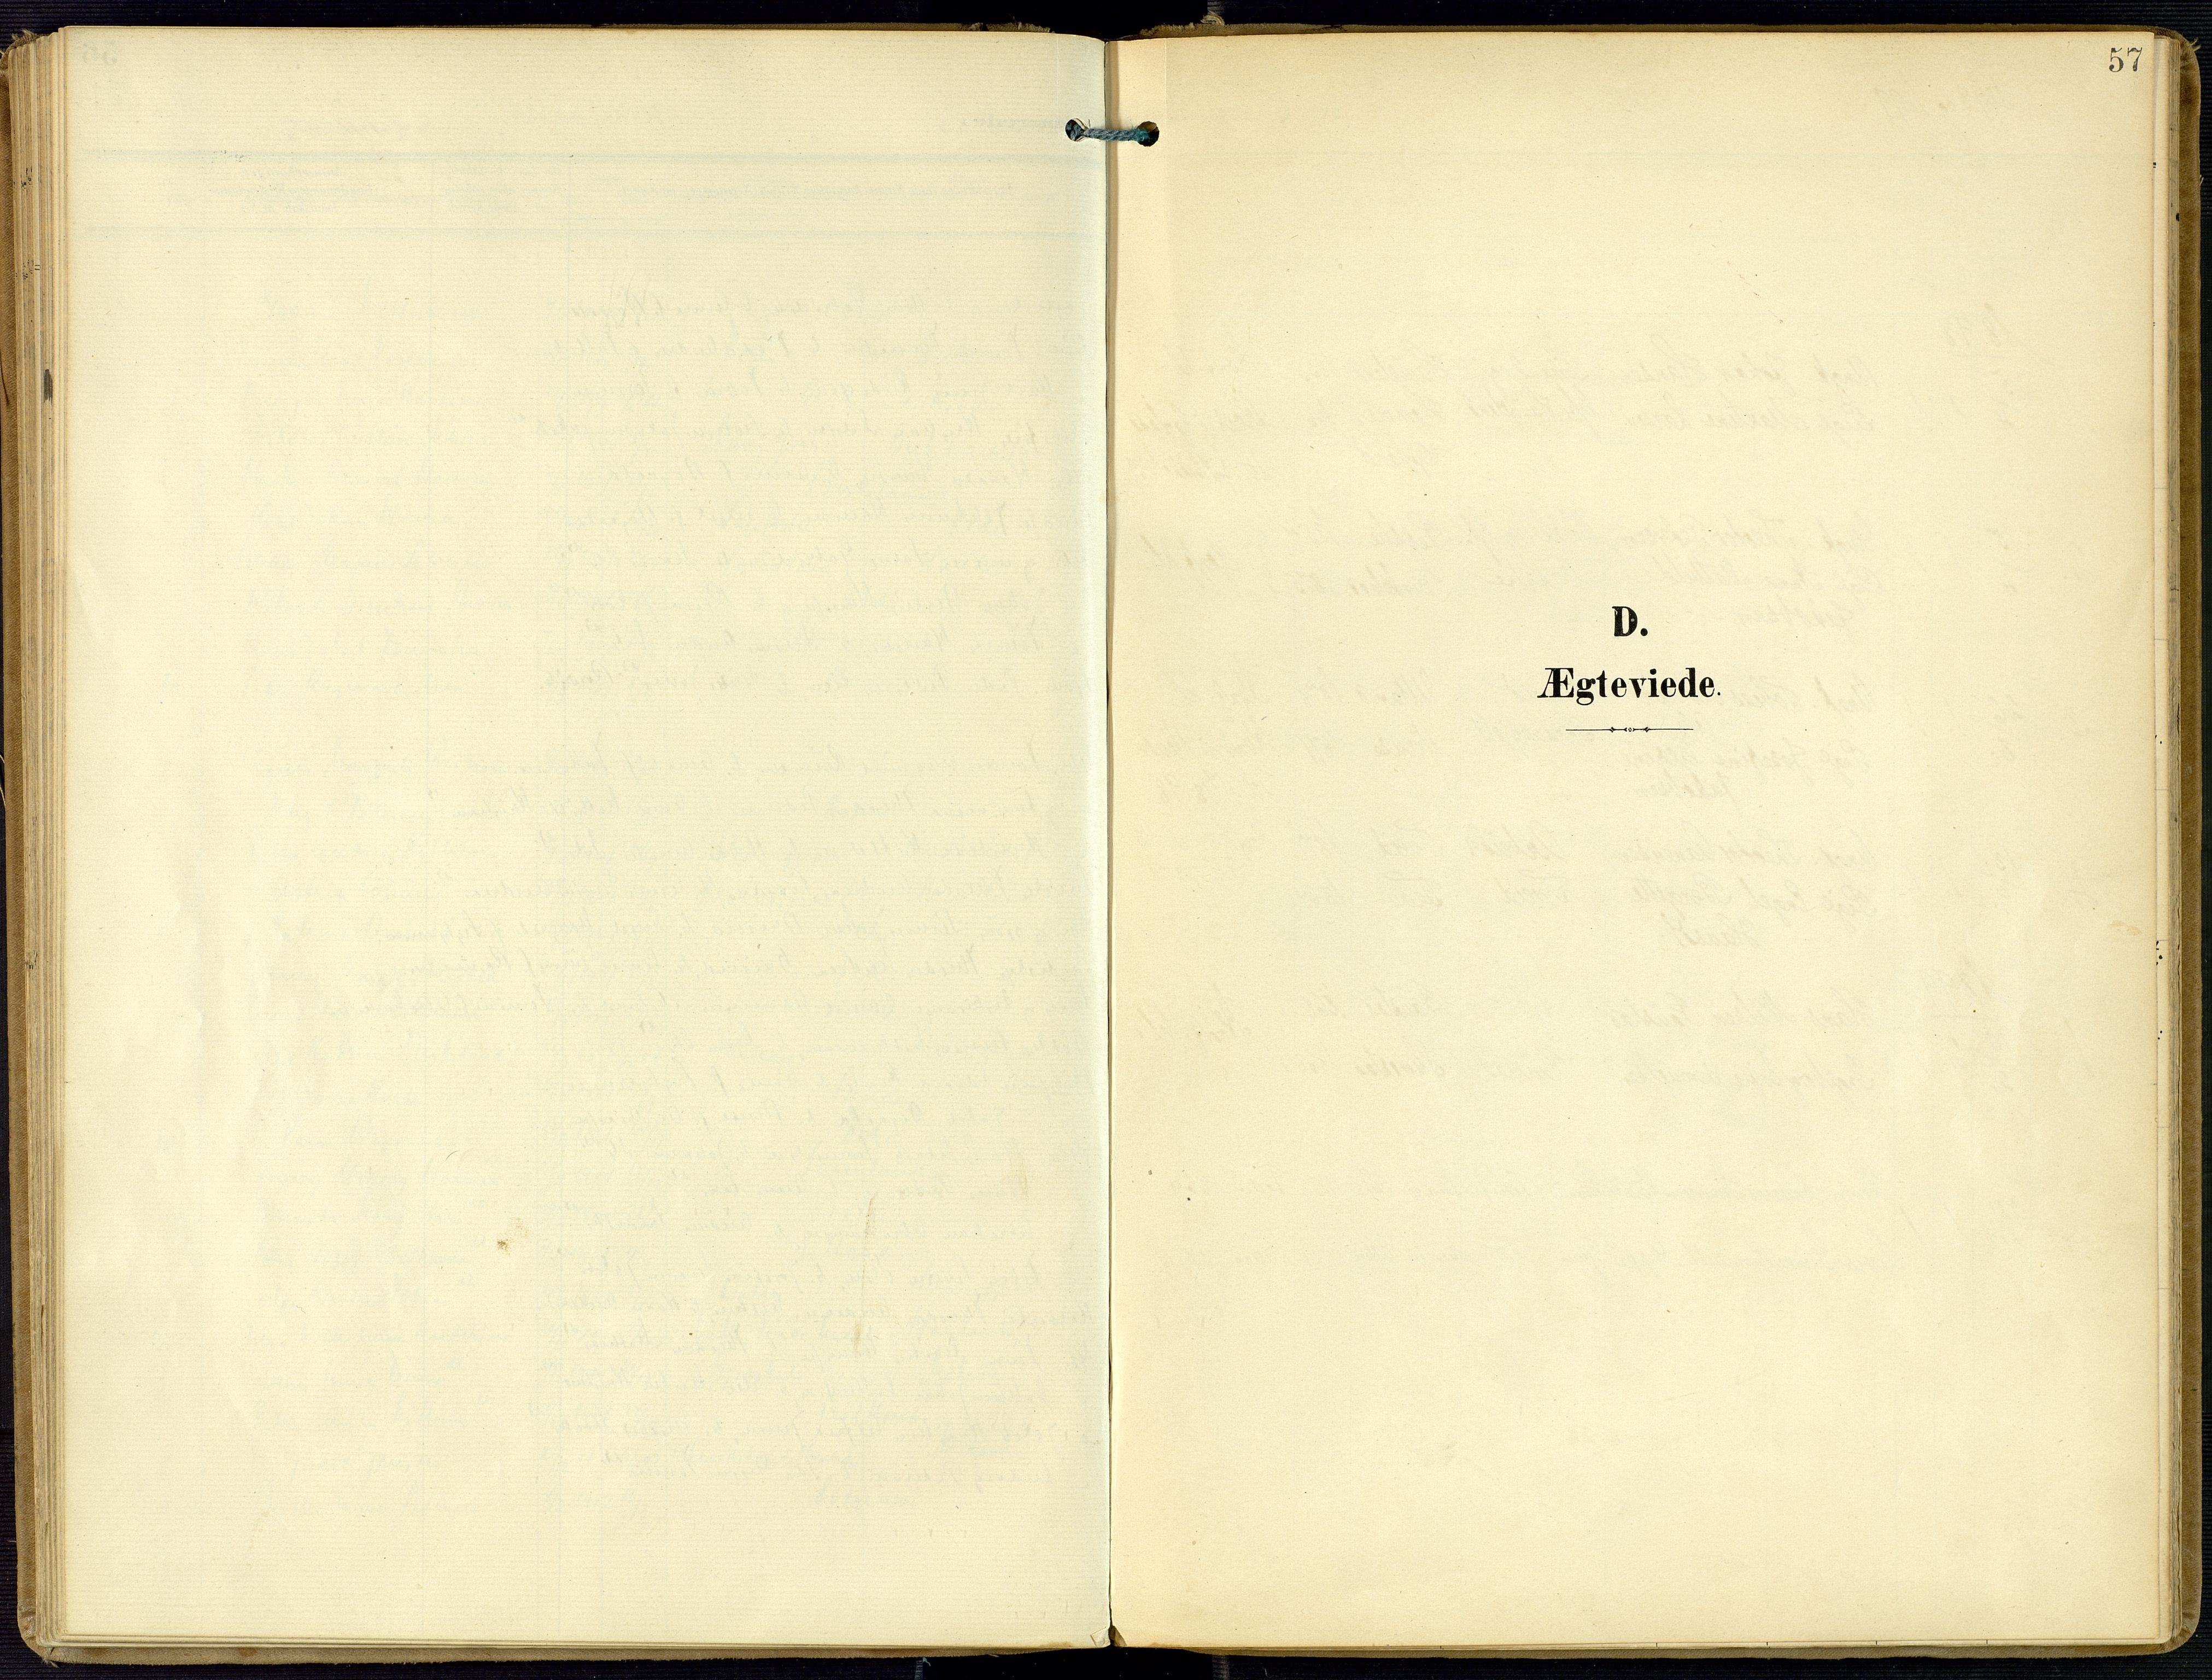 SAK, Kvinesdal sokneprestkontor, F/Fa/Faa/L0005: Ministerialbok nr. A 5, 1898-1915, s. 57